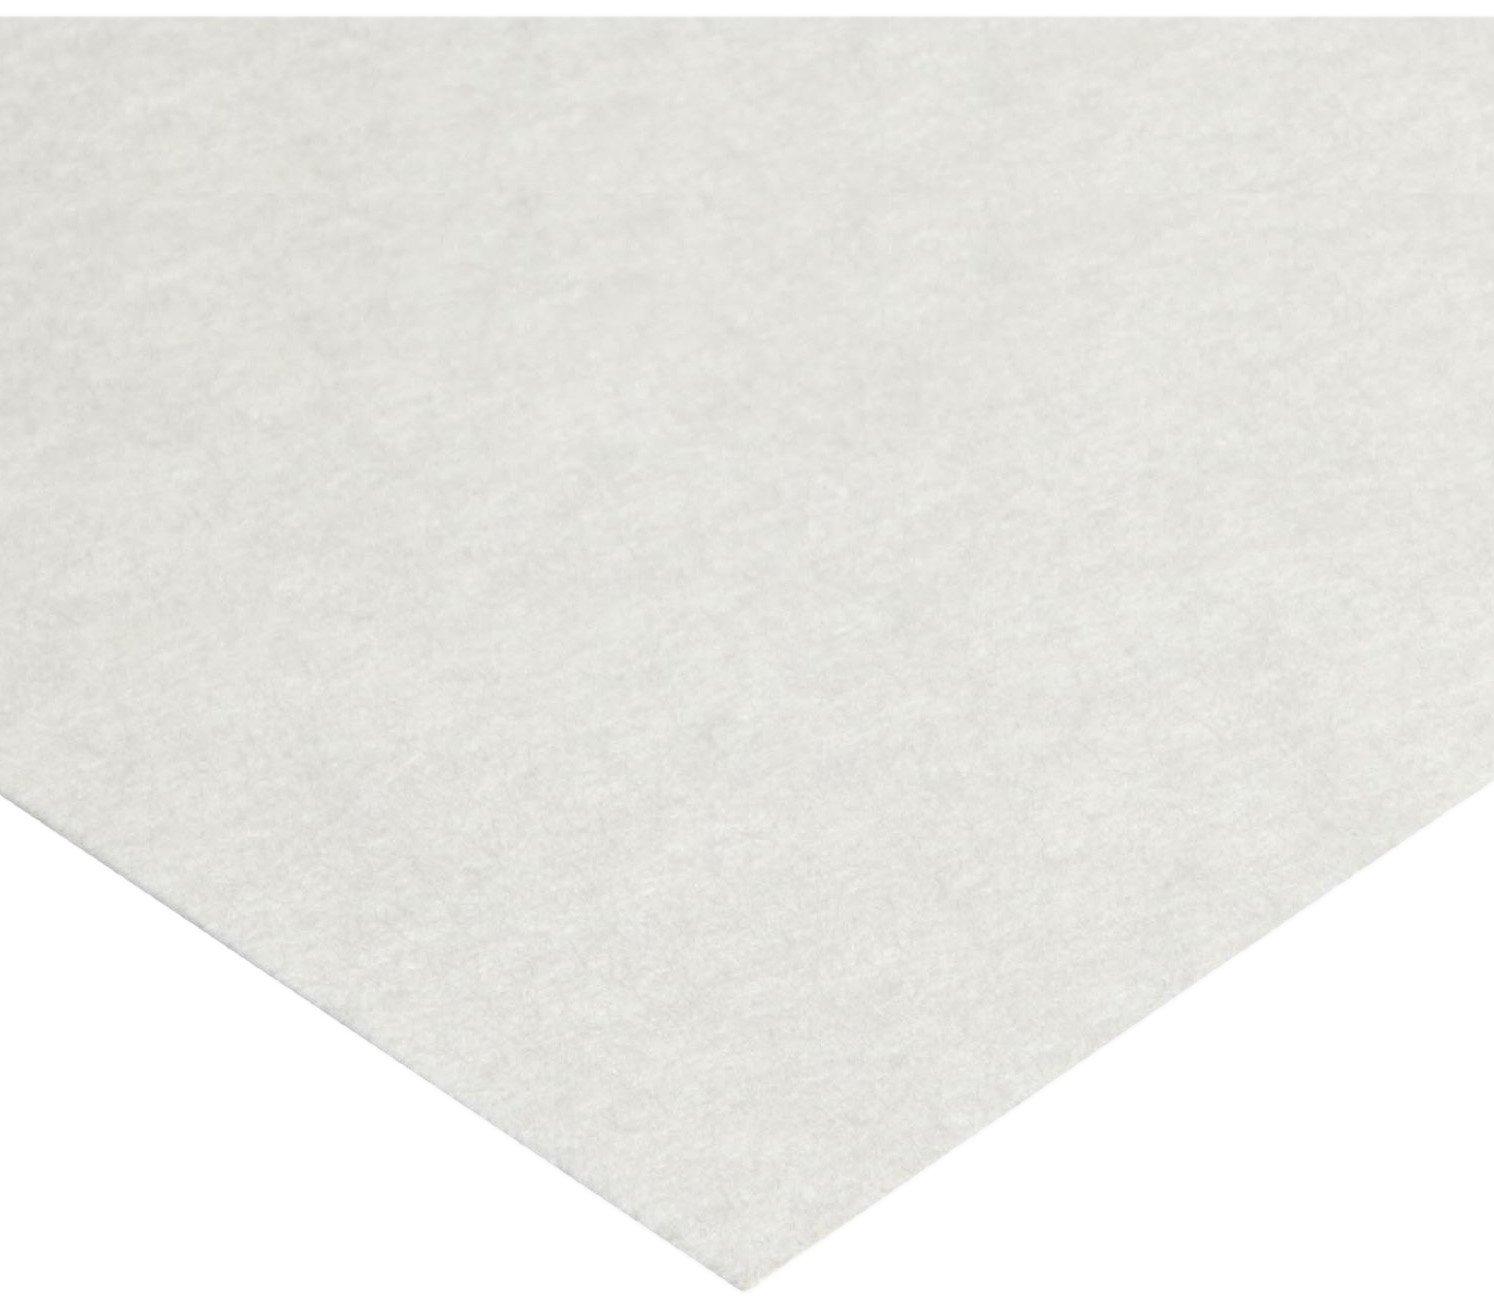 GE Whatman 3030-6188 Grade 3MM Chr Cellulose Chromatography Paper Sheet, 15cm Width, 20cm Length (Pack of 100)